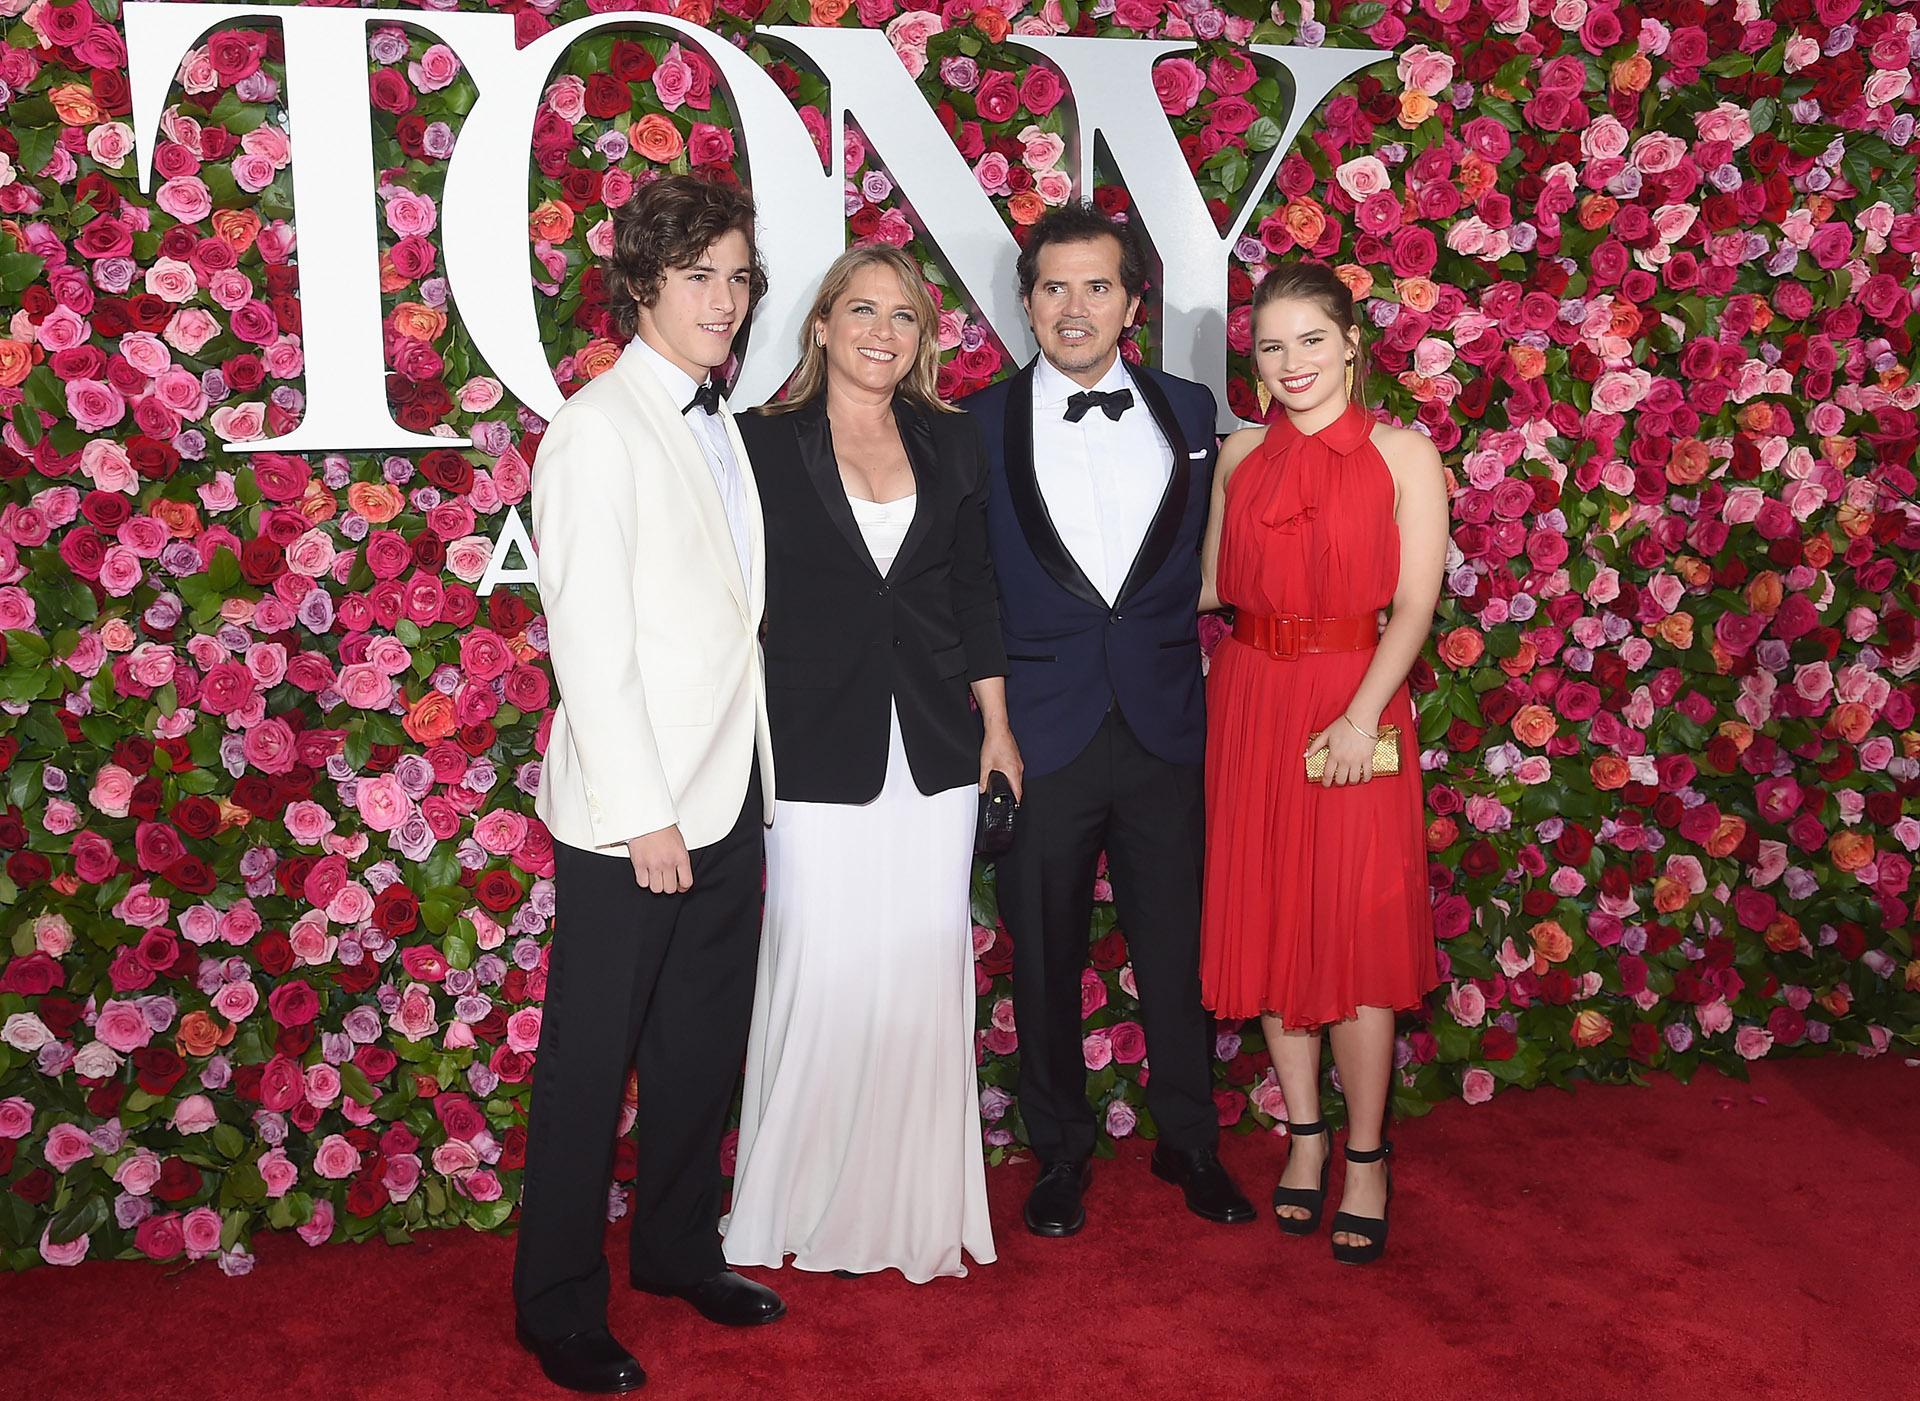 Lucas Leguizamo, Justine Maurer, John Leguizamo y Allegra Leguizamo (Jamie McCarthy/Getty Images/AFP)